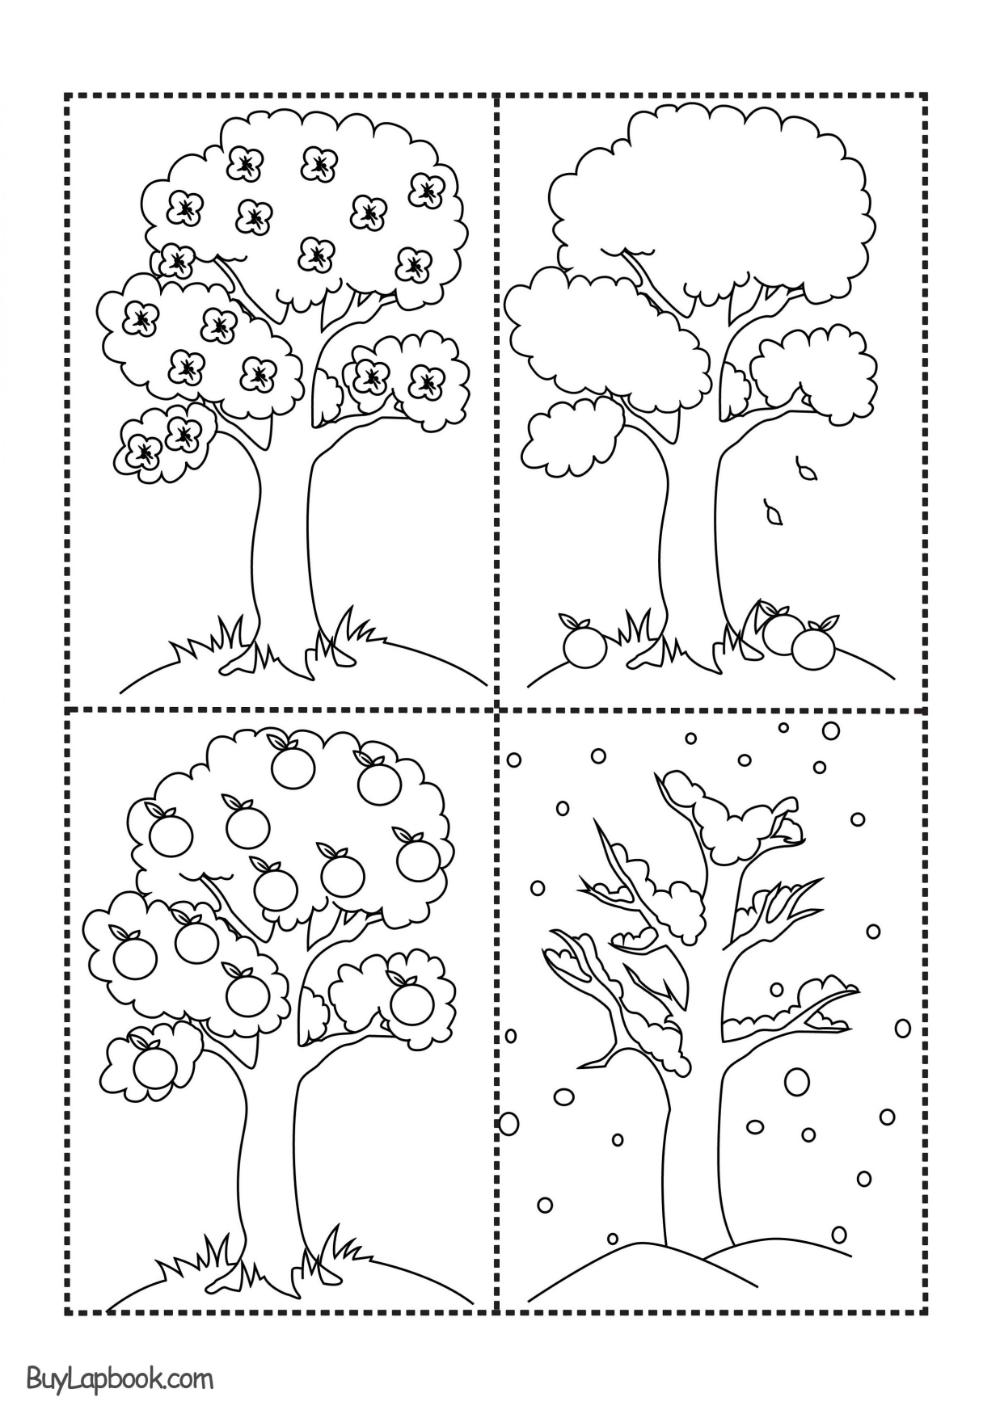 Az Apple Tree Nyomtathato Negy Evszaka Buylapbook Seasons Worksheets Seasons Kindergarten Four Seasons [ 1414 x 1000 Pixel ]